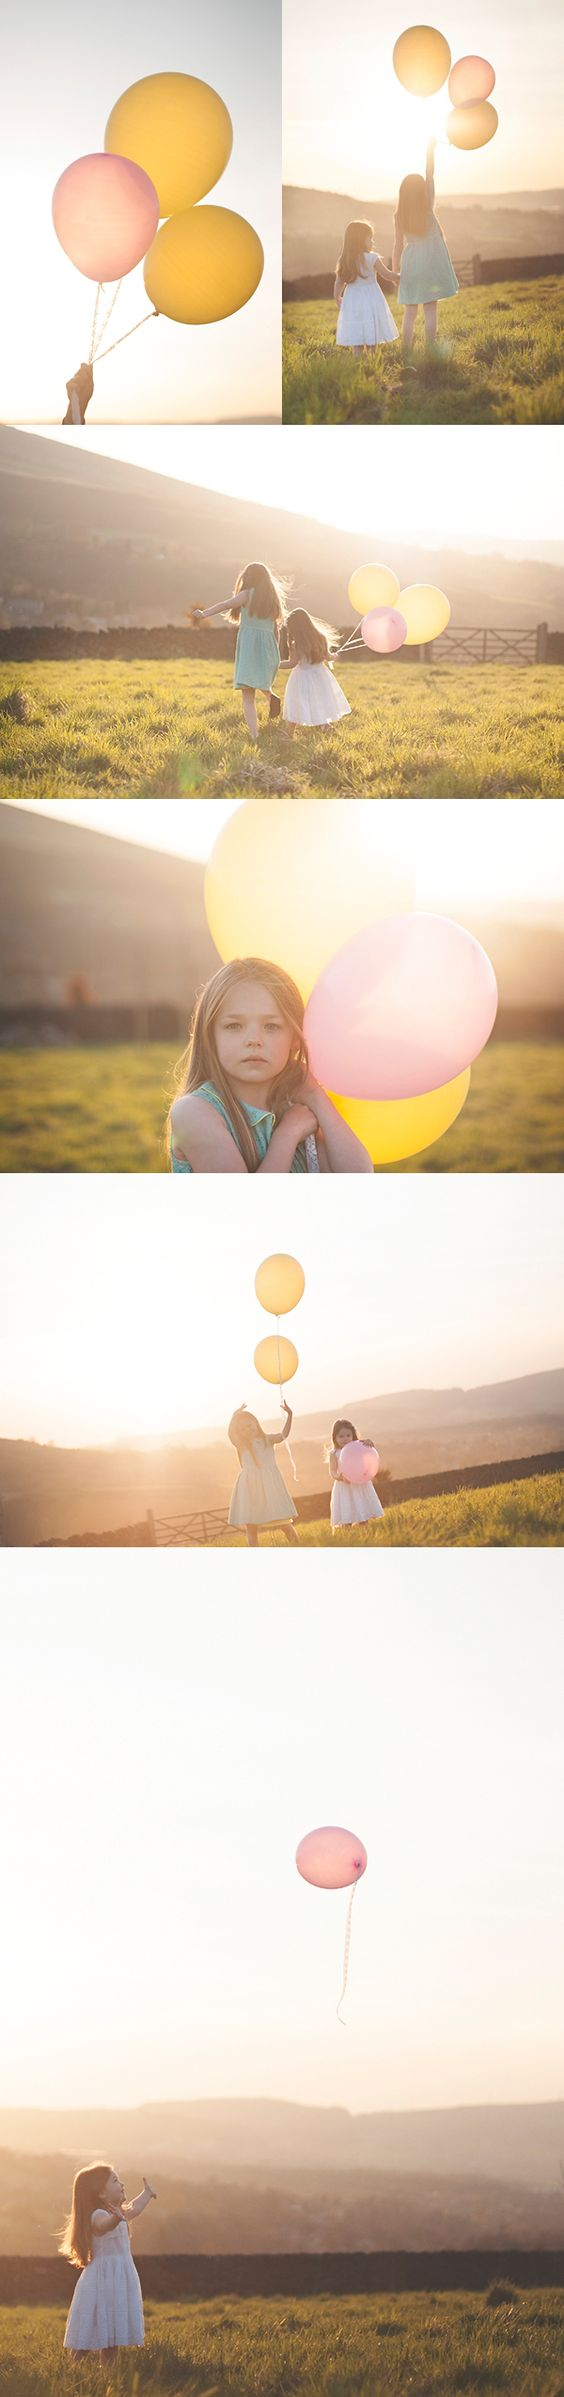 Cute photoshoot idea for a Summer inspired photo book | #photobook #photography #summer |